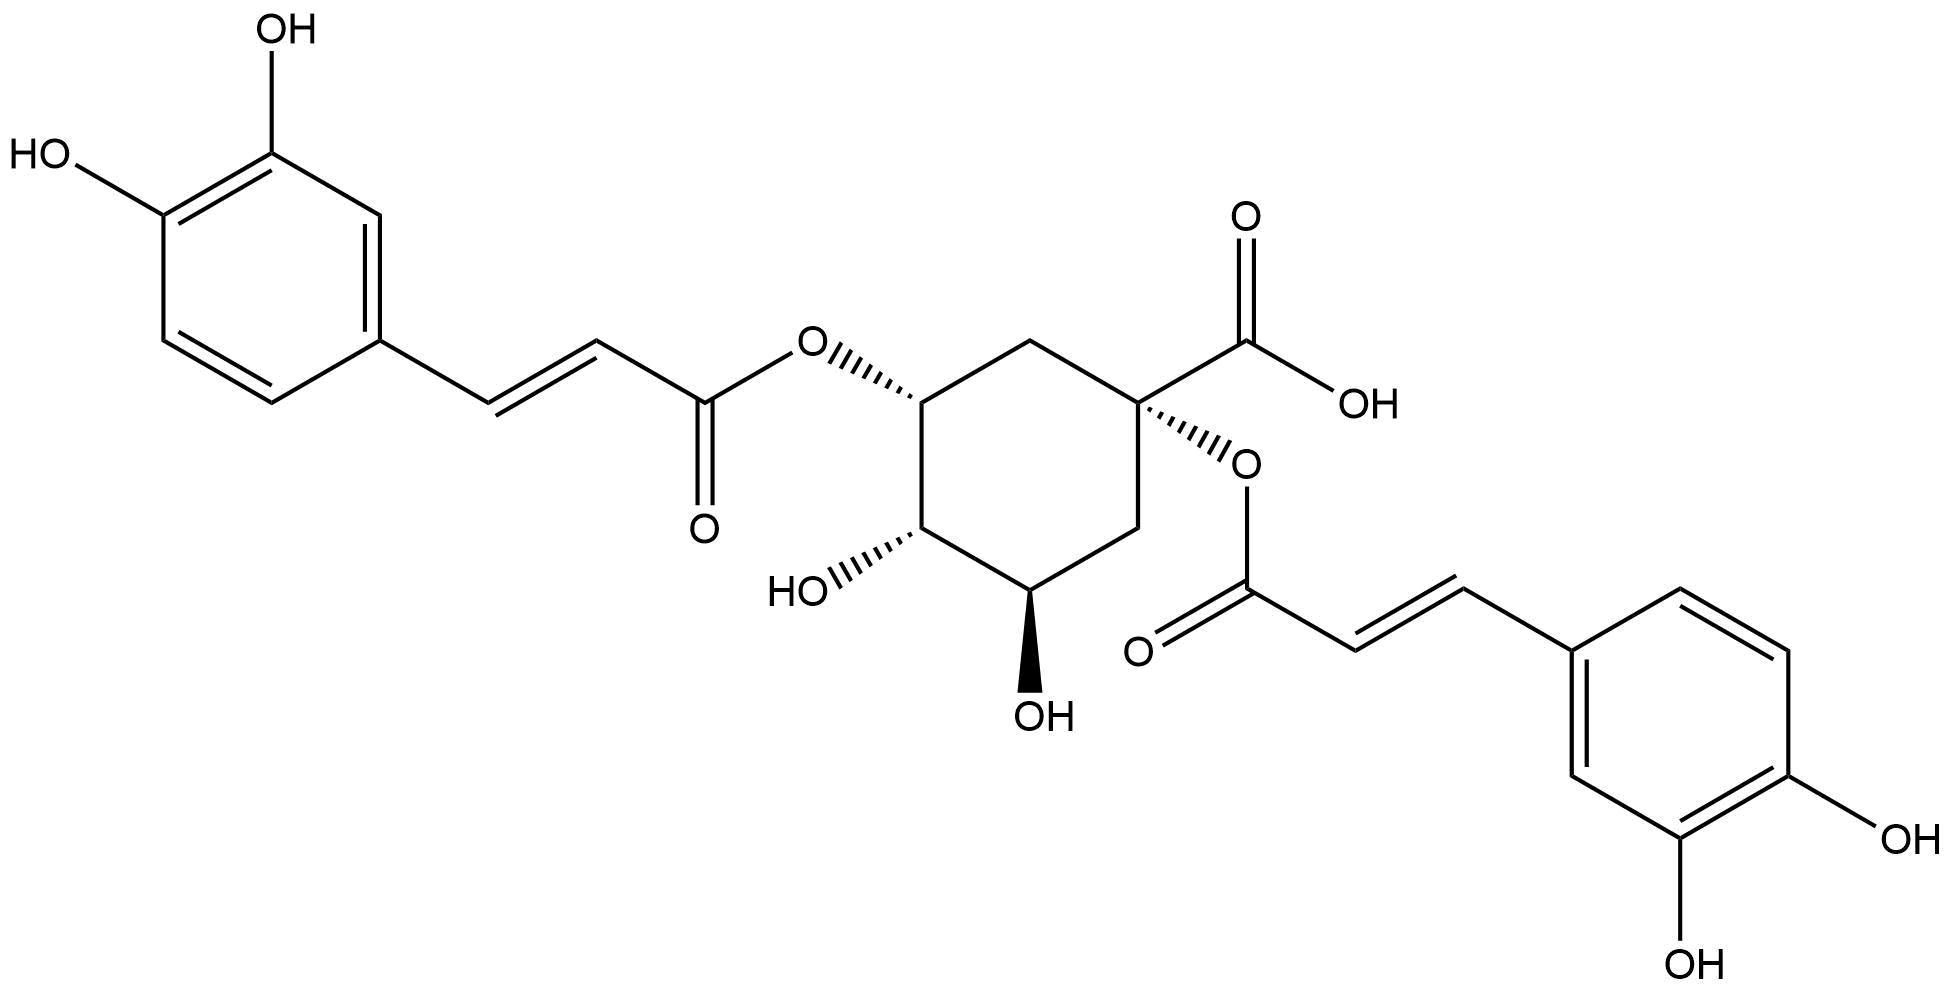 1,3-Dicaffeoylquinic acid